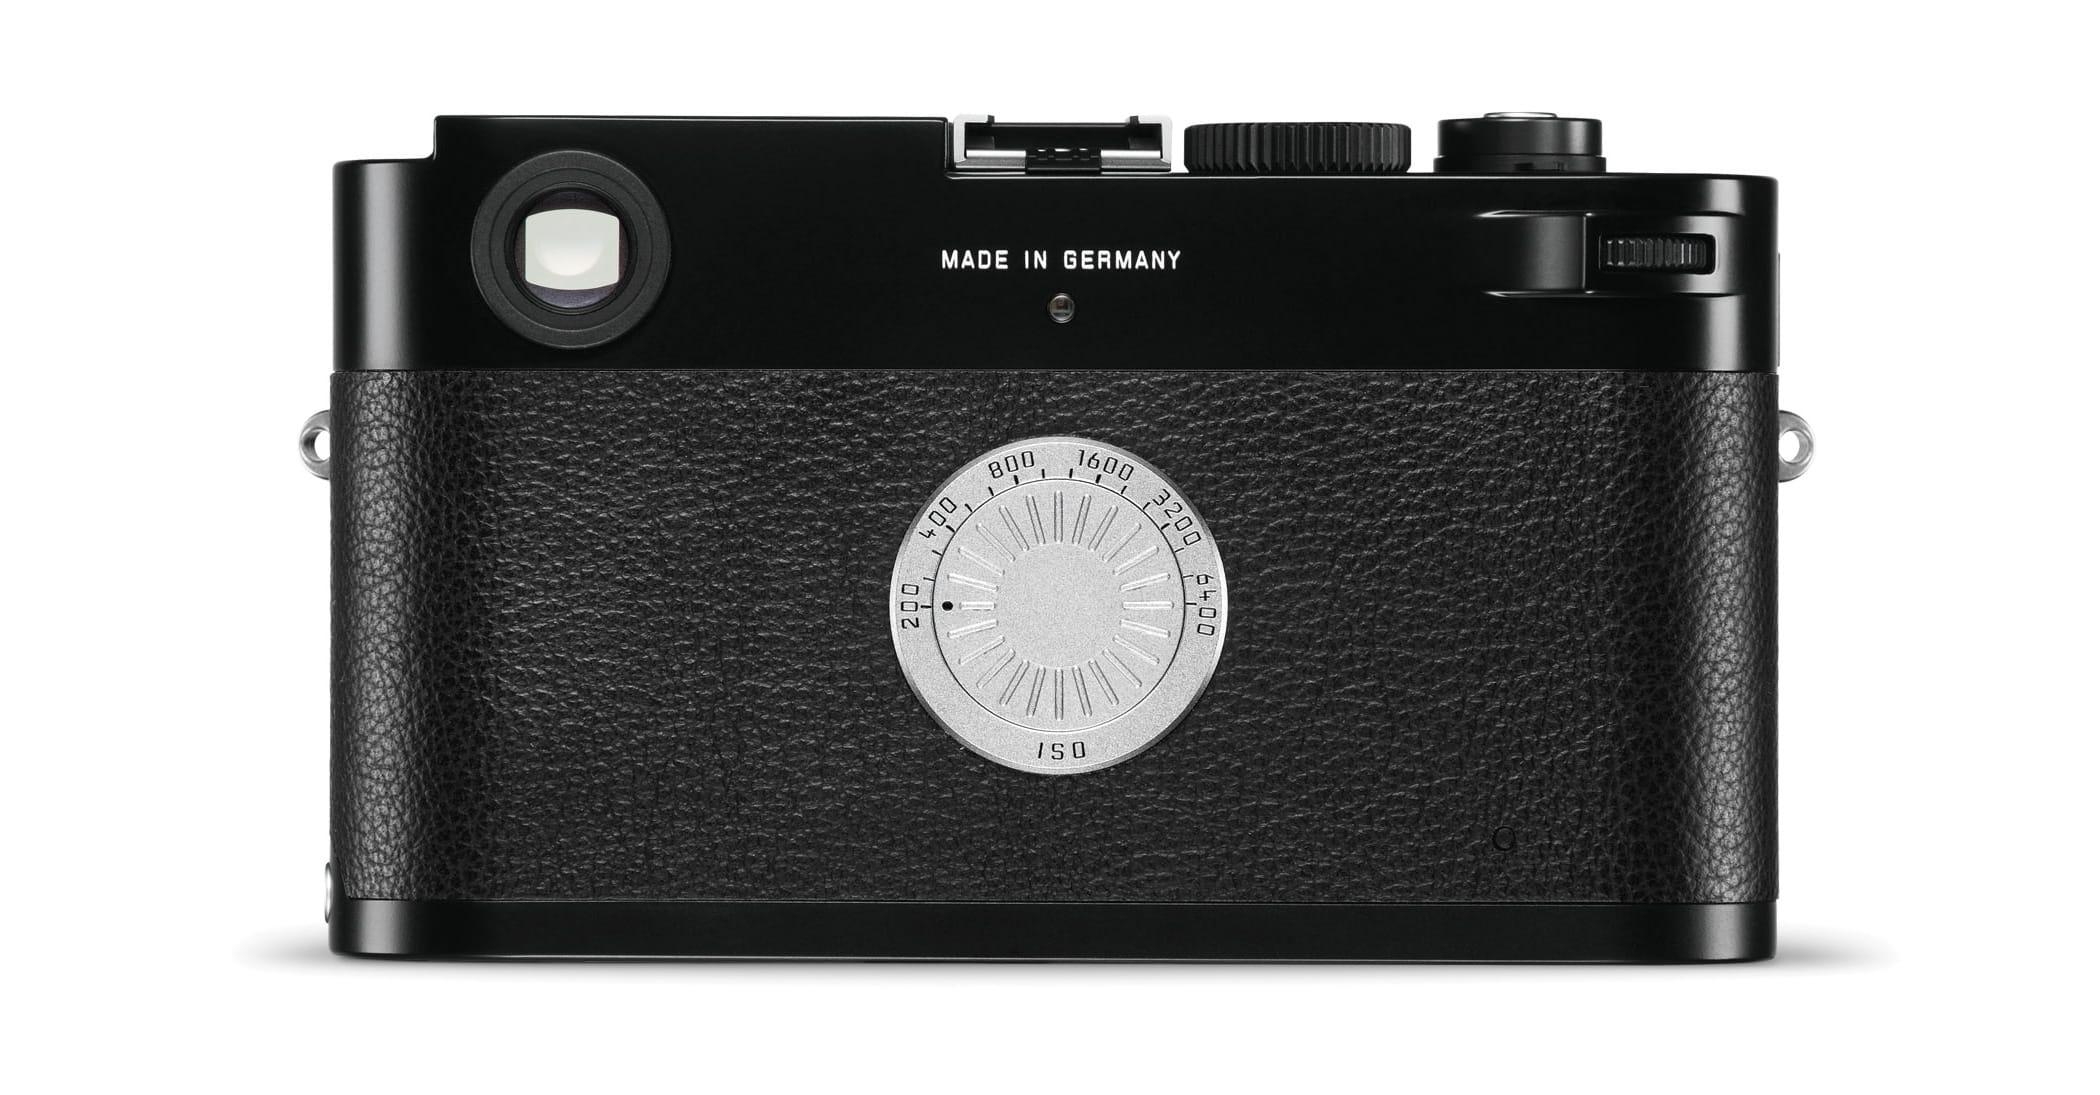 Leica-M-D-Typ-262-back-fb